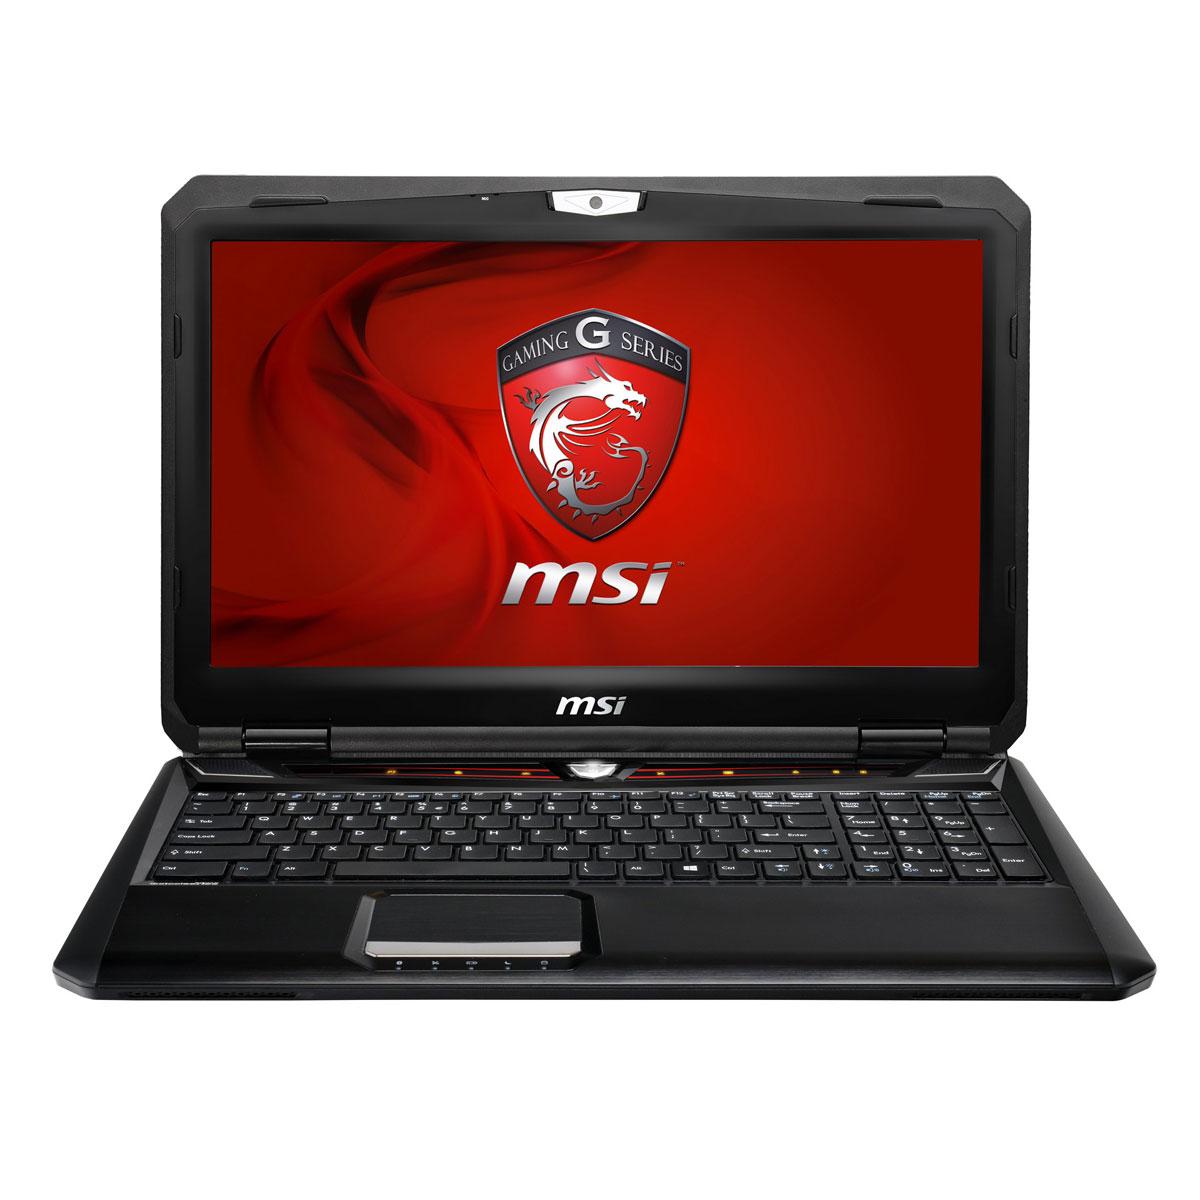 "PC portable MSI GX60 3BE-246XFR Hitman Edition AMD Quad-Core A10-5750M 8 Go 750 Go 15.6"" LED AMD Radeon HD 8970M Graveur DVD Wi-Fi N/Bluetooth Webcam FreeDOS (garantie constructeur 1 an)"